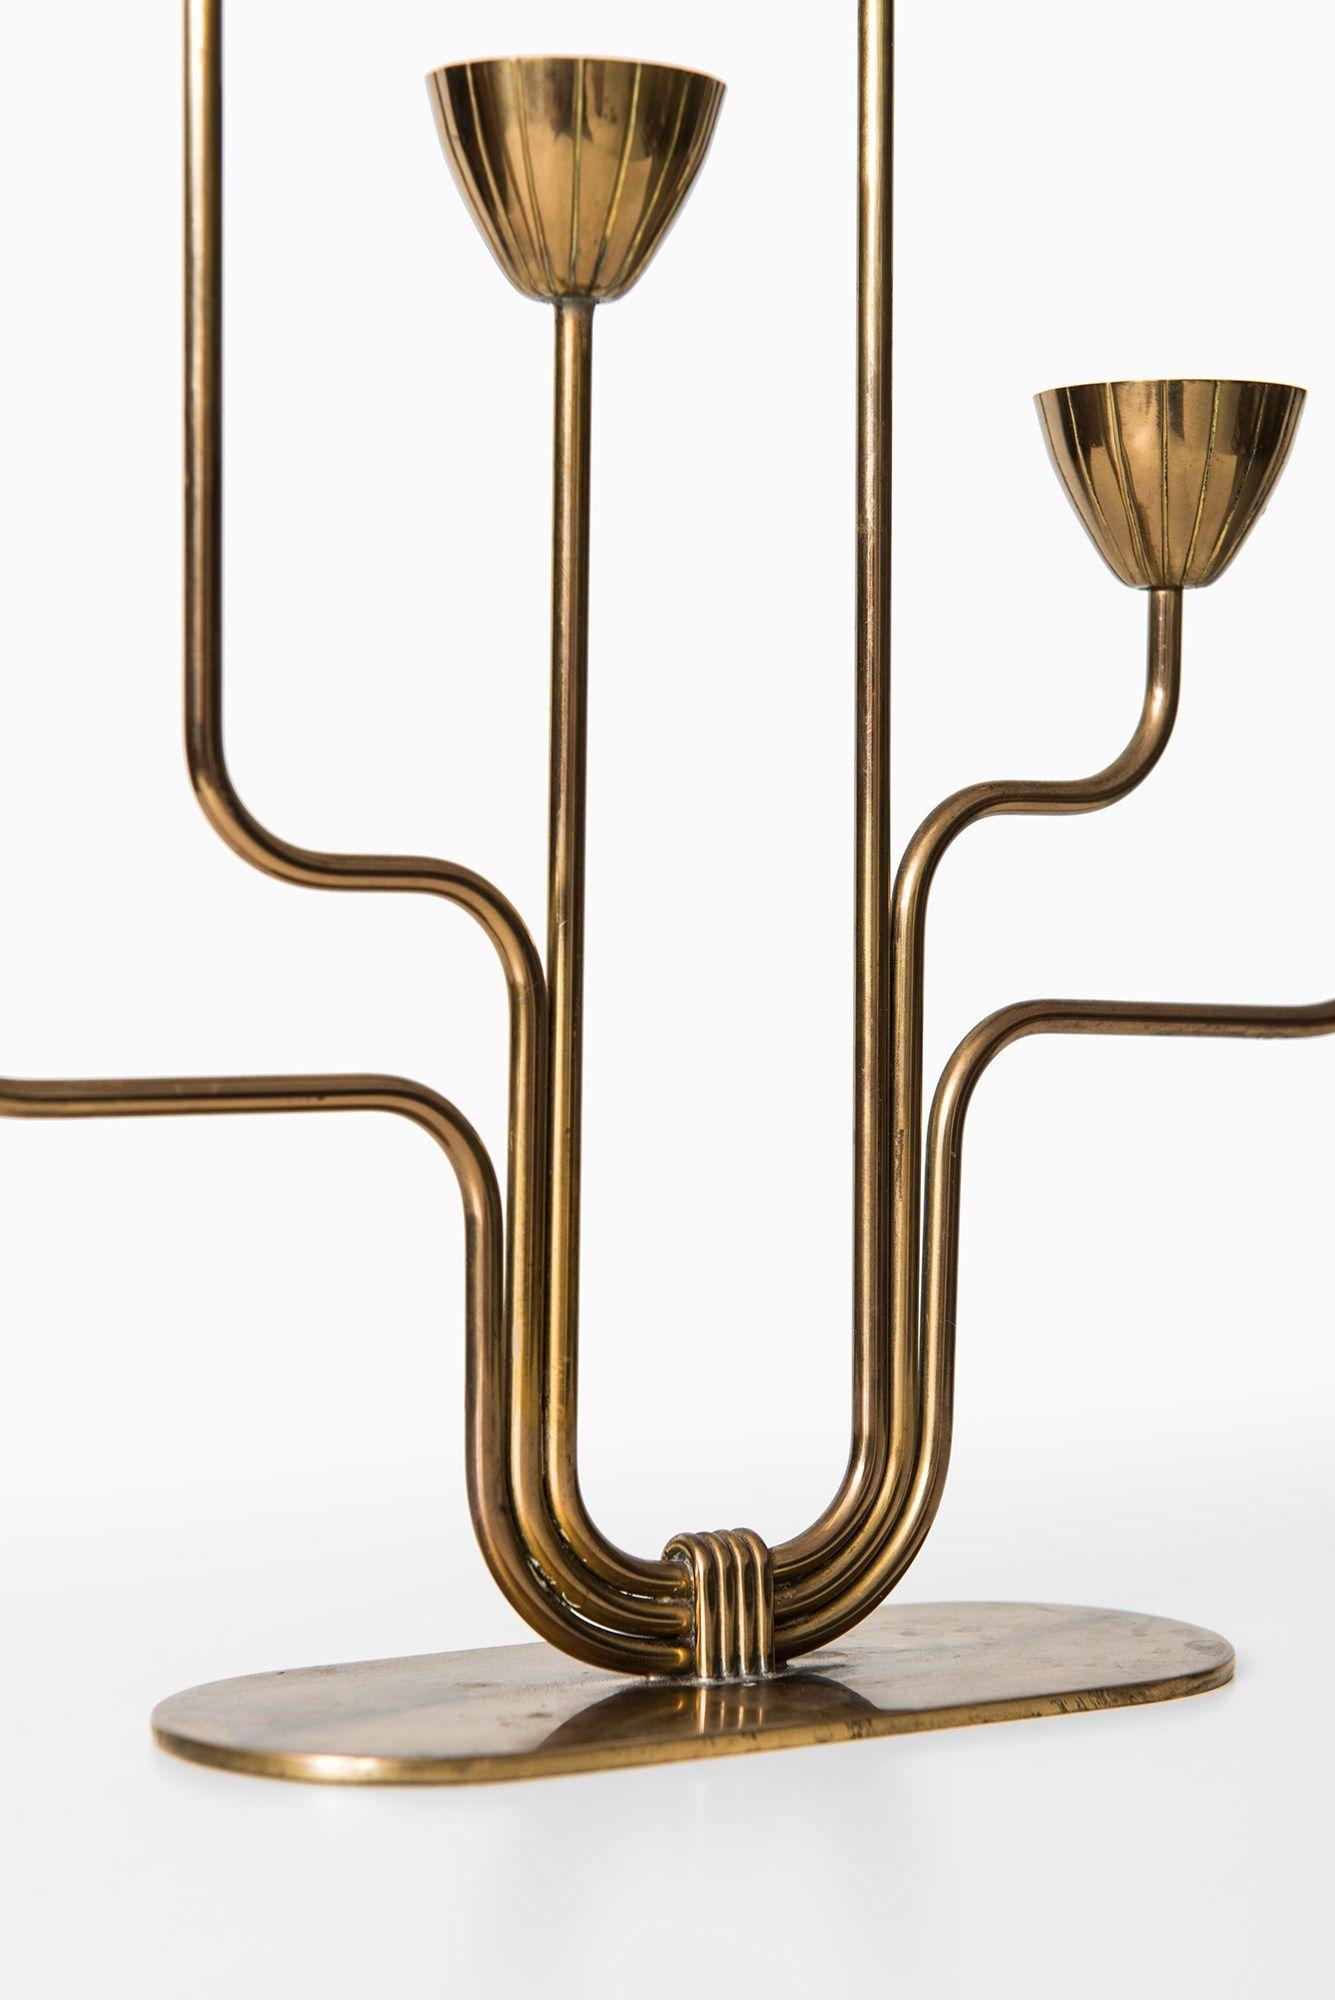 Gunnar ander candlestick in brass at studio schalling studio